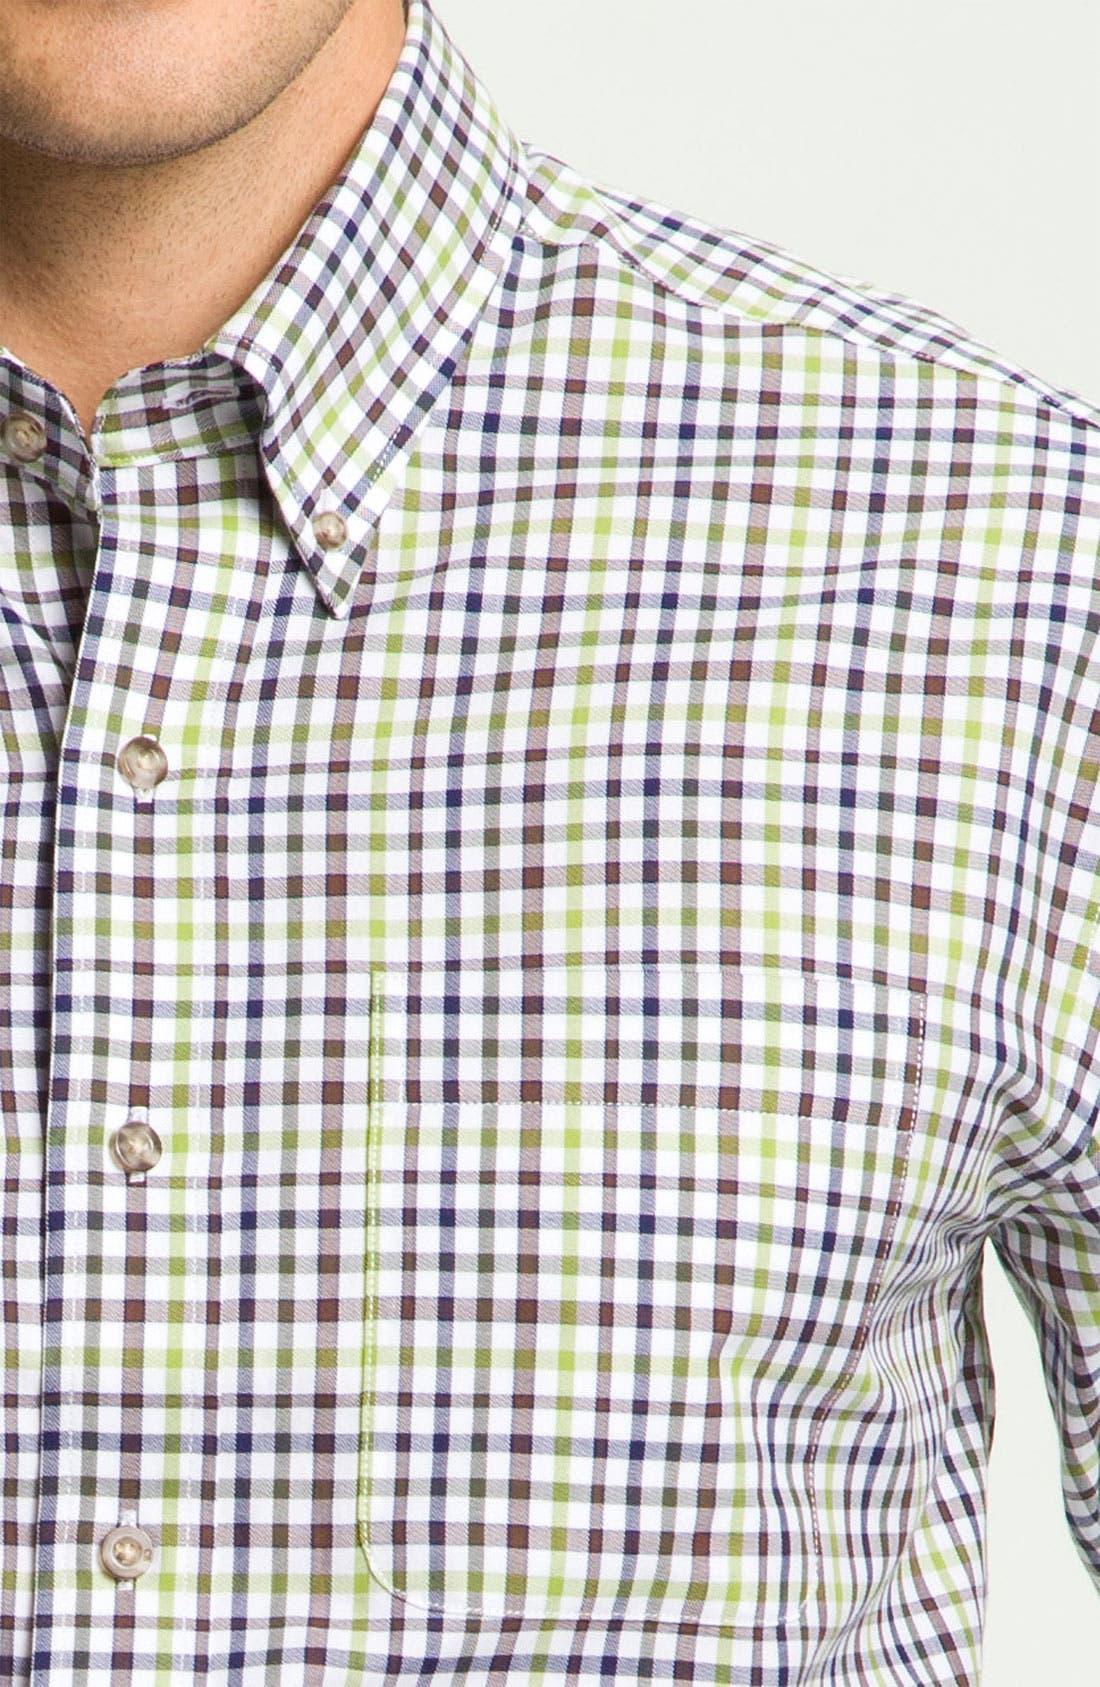 Alternate Image 3  - Cutter & Buck 'Cypress' Plaid Sport Shirt (Big & Tall)